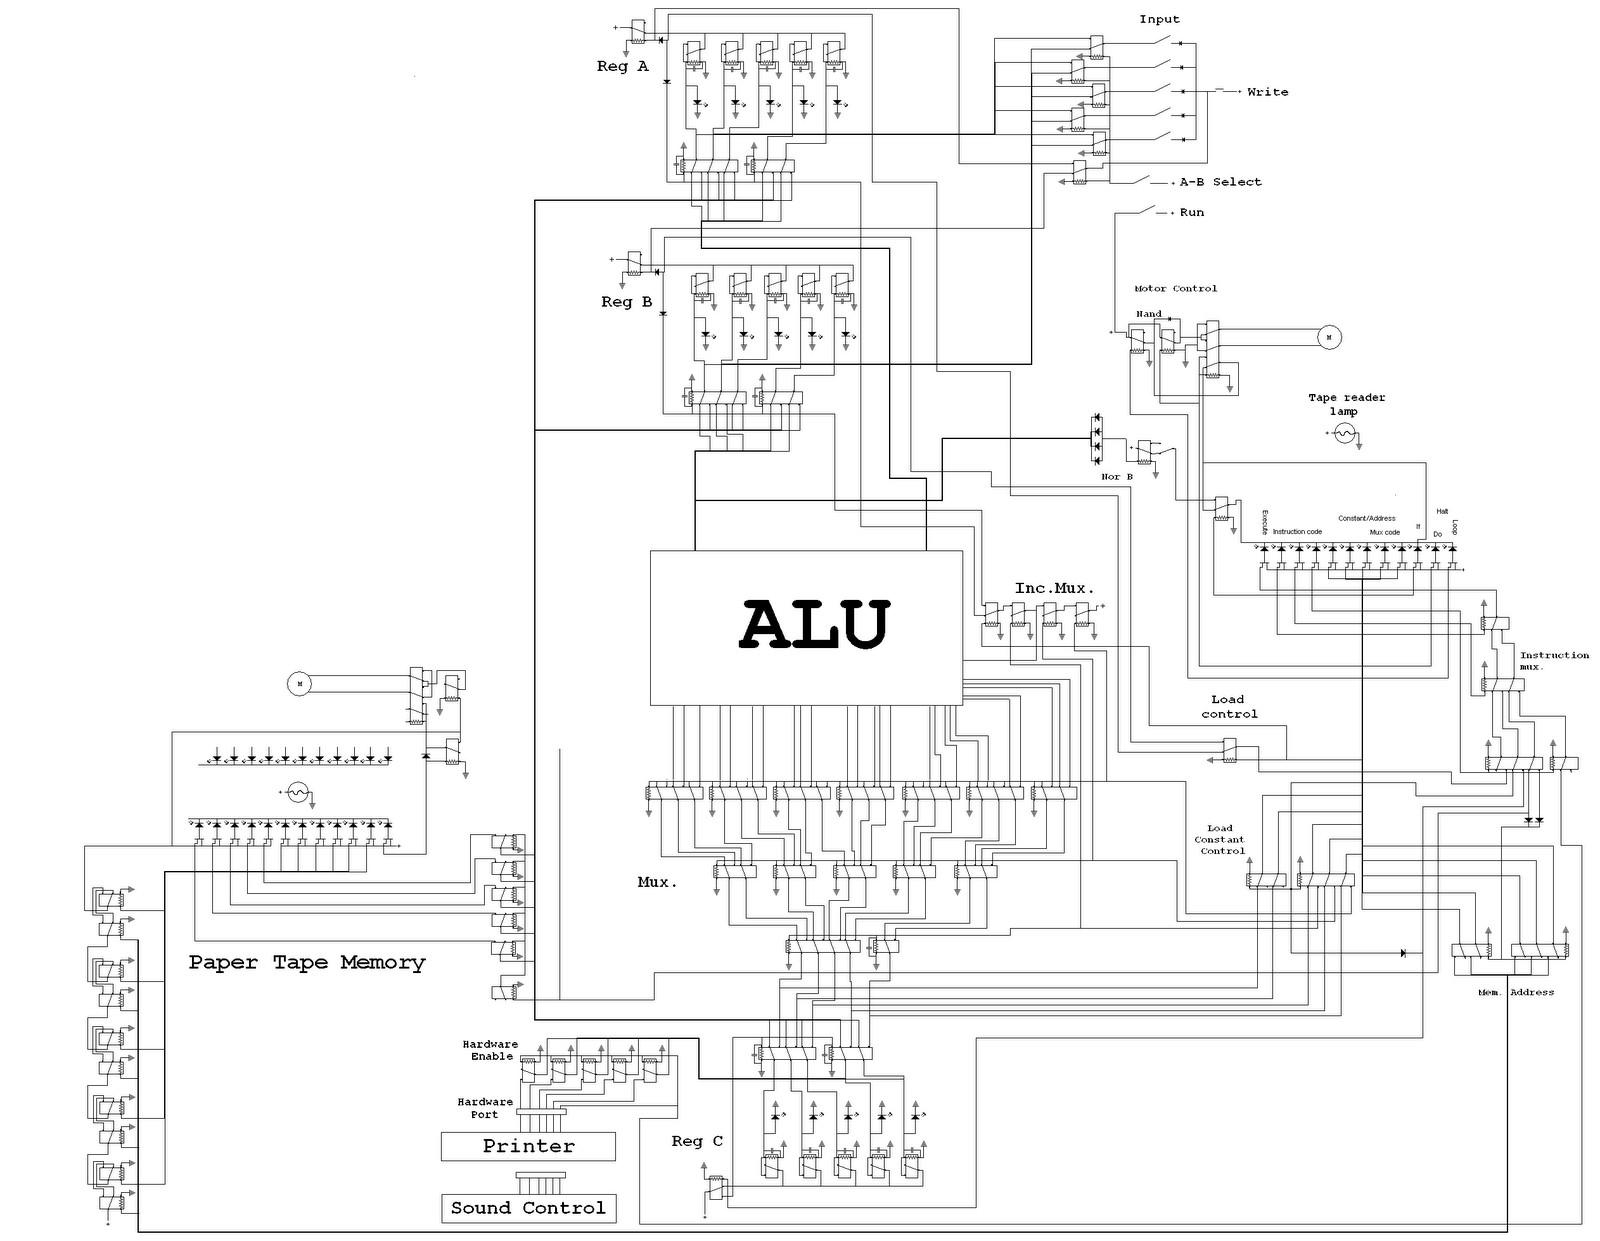 polaris sportsman 90 wiring diagram 2000 jeep cherokee sport stereo 2014 ram 1500 suzuki wagon r database8 bit alu circuit auto electrical